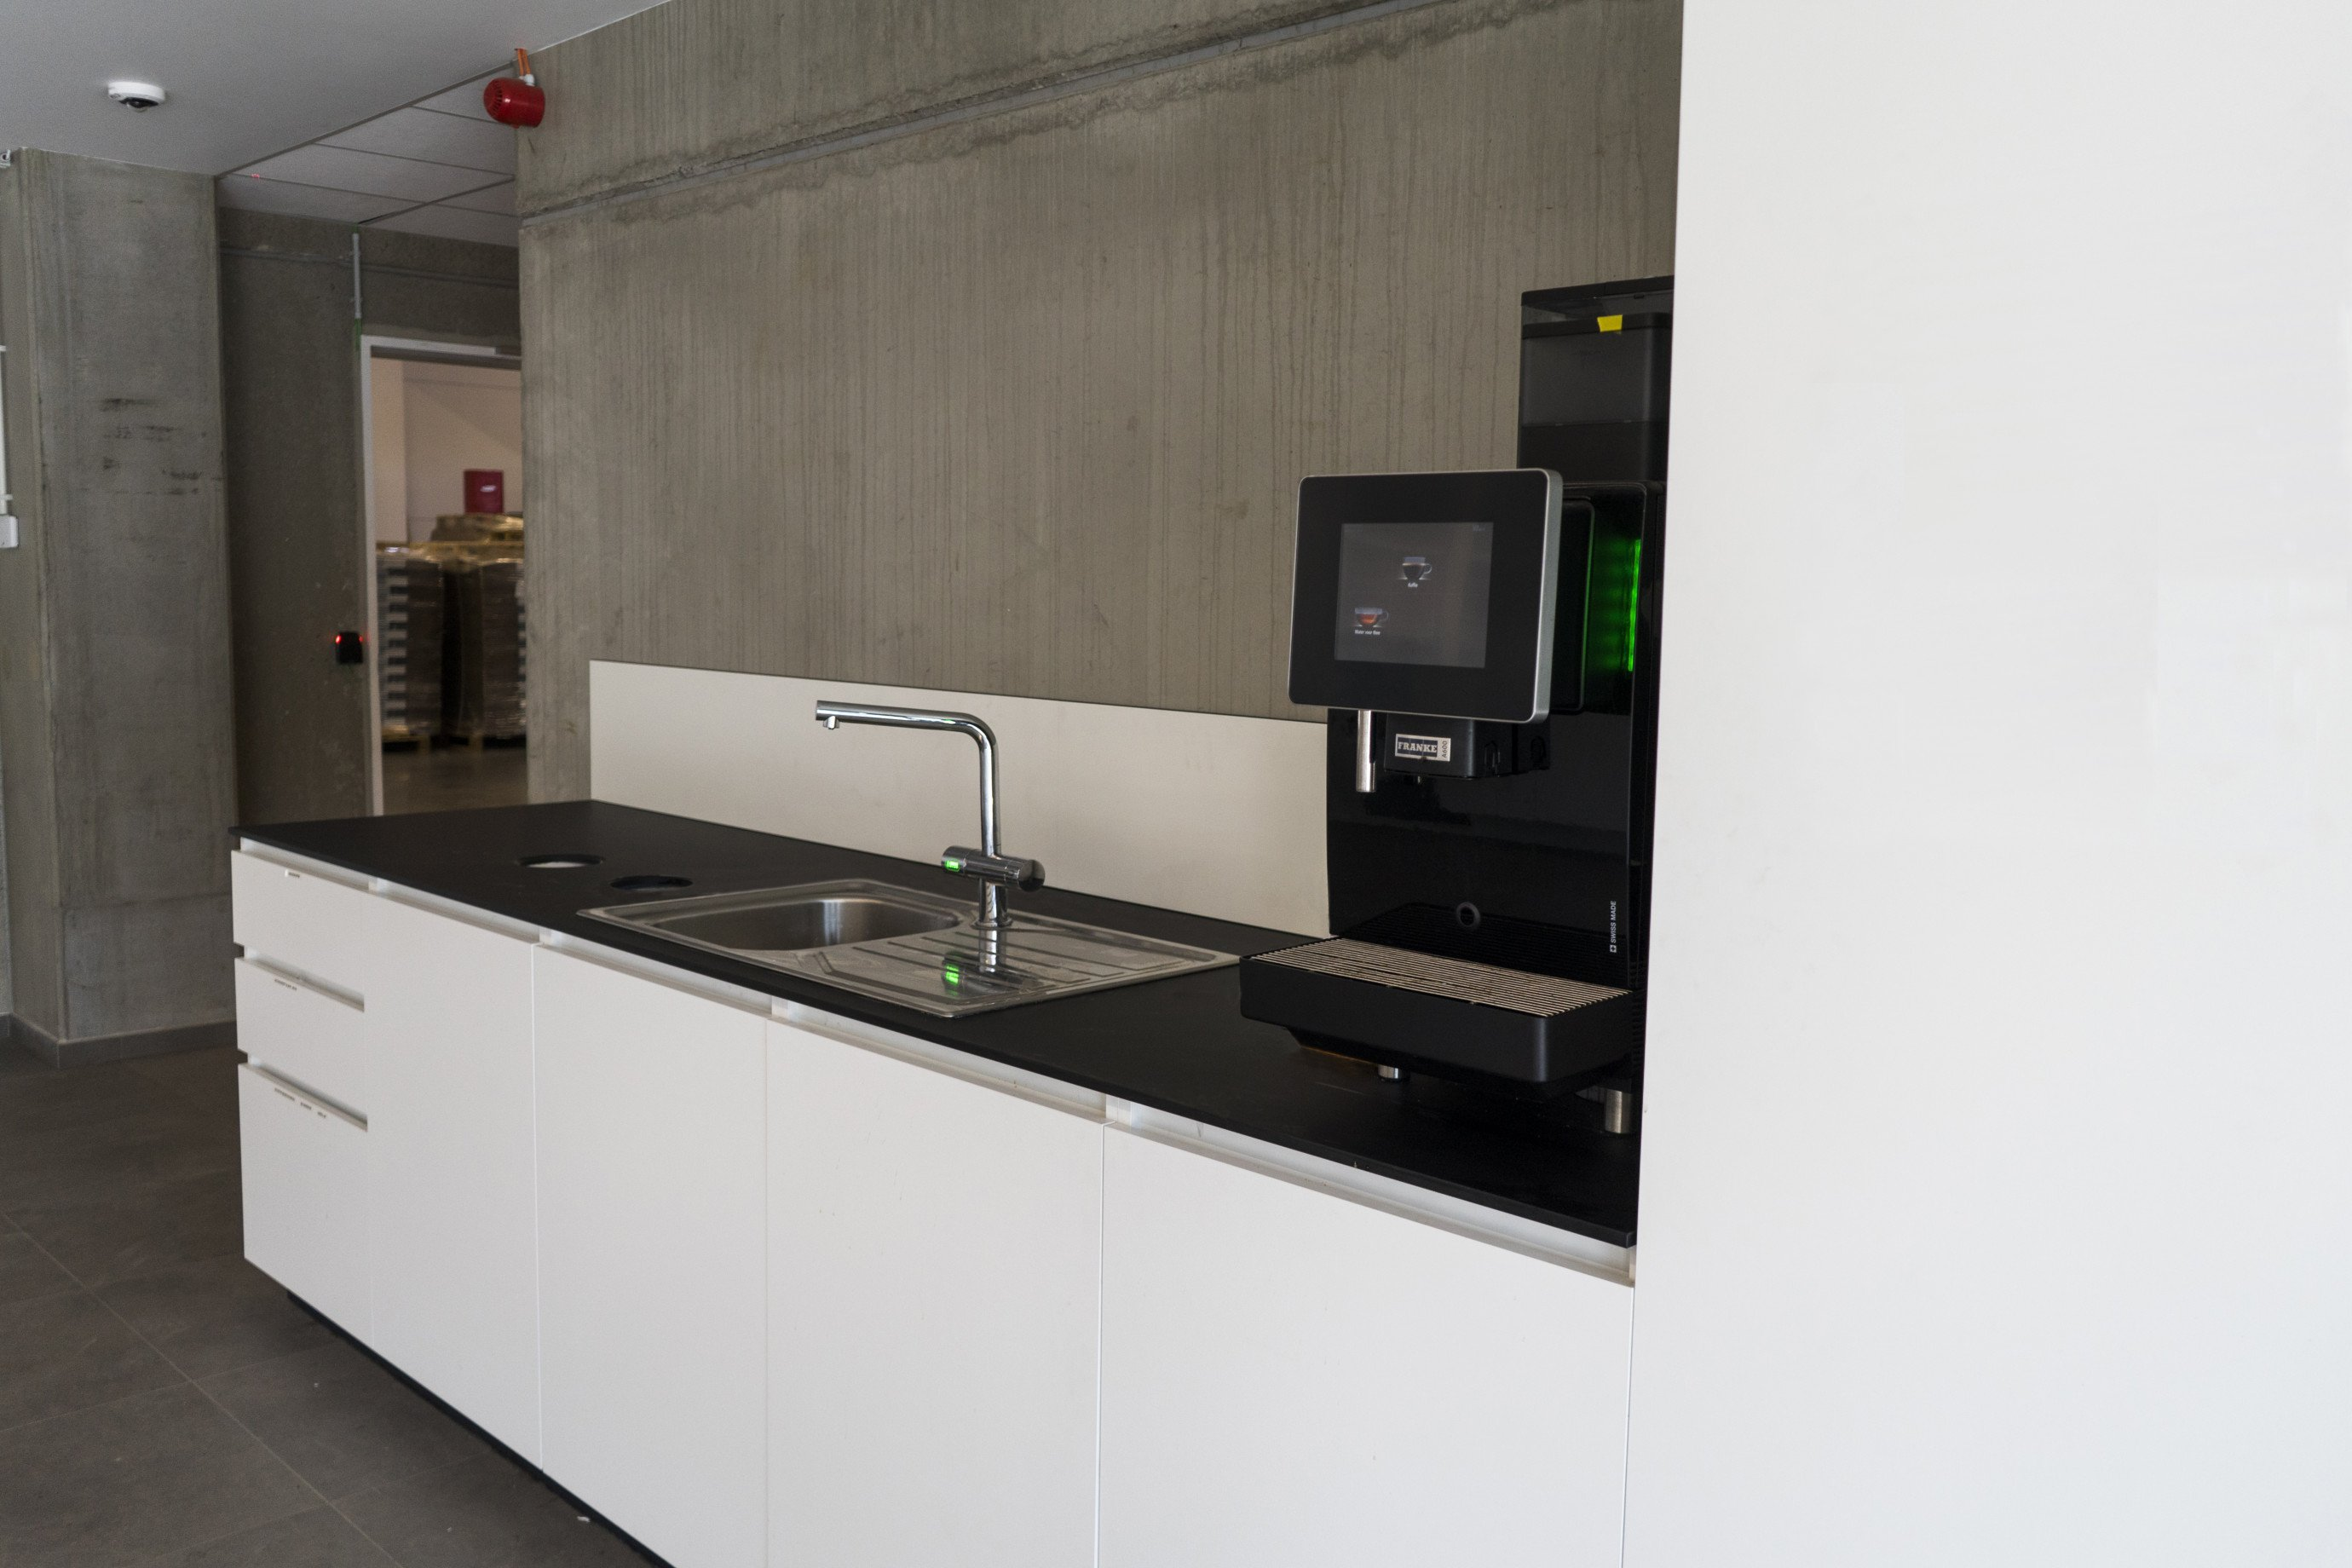 Laboratoriummeubilair: bedrijfskeuken